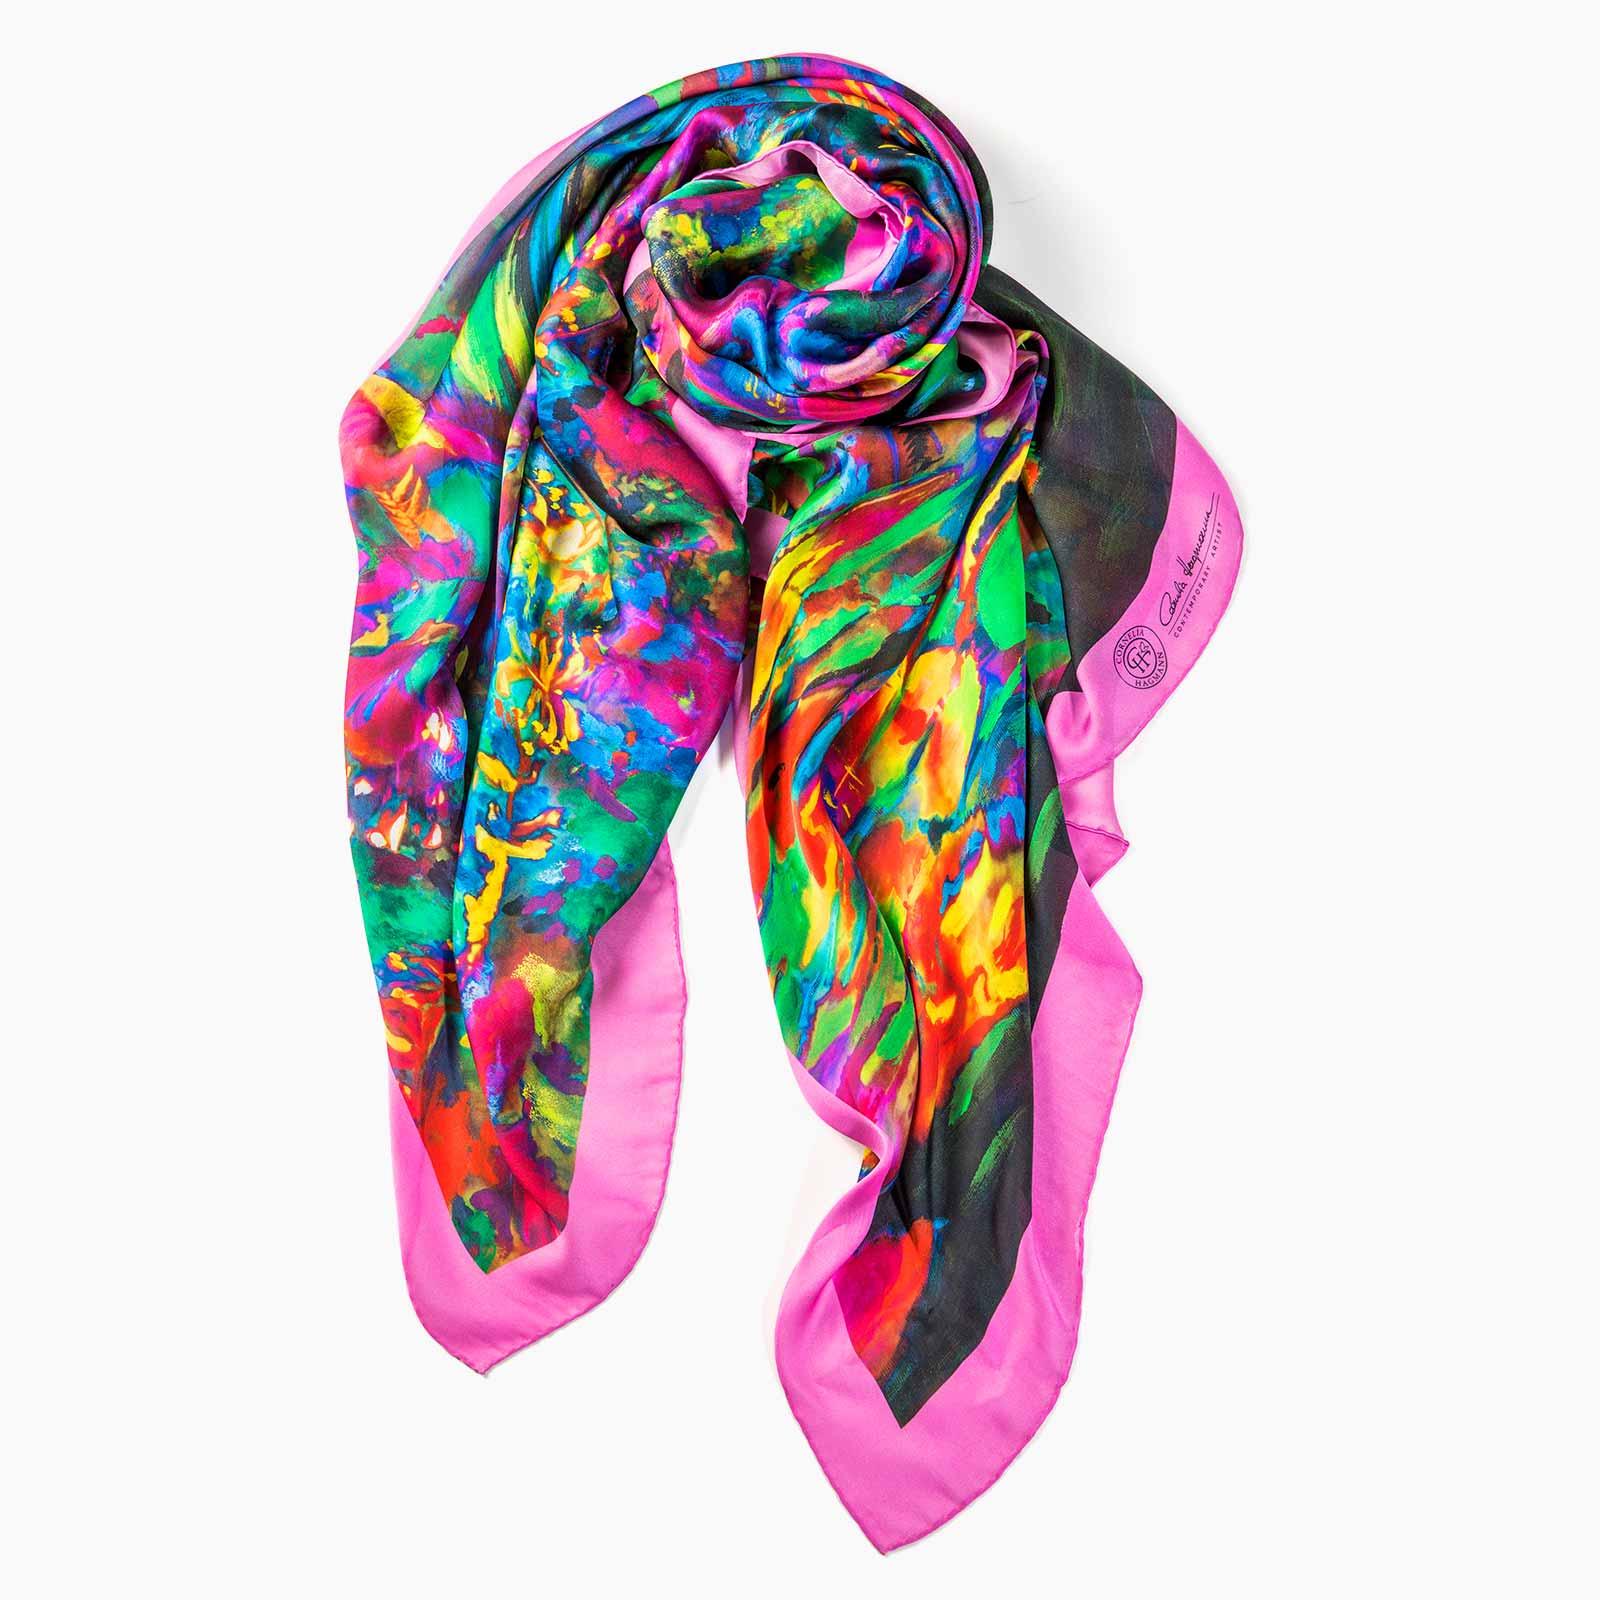 Cornelia Hagmann Contemporary Artist La Galleria Silk Scarf Peace Rosee, Seidenschal, sciarpa di seta, foulard soie,